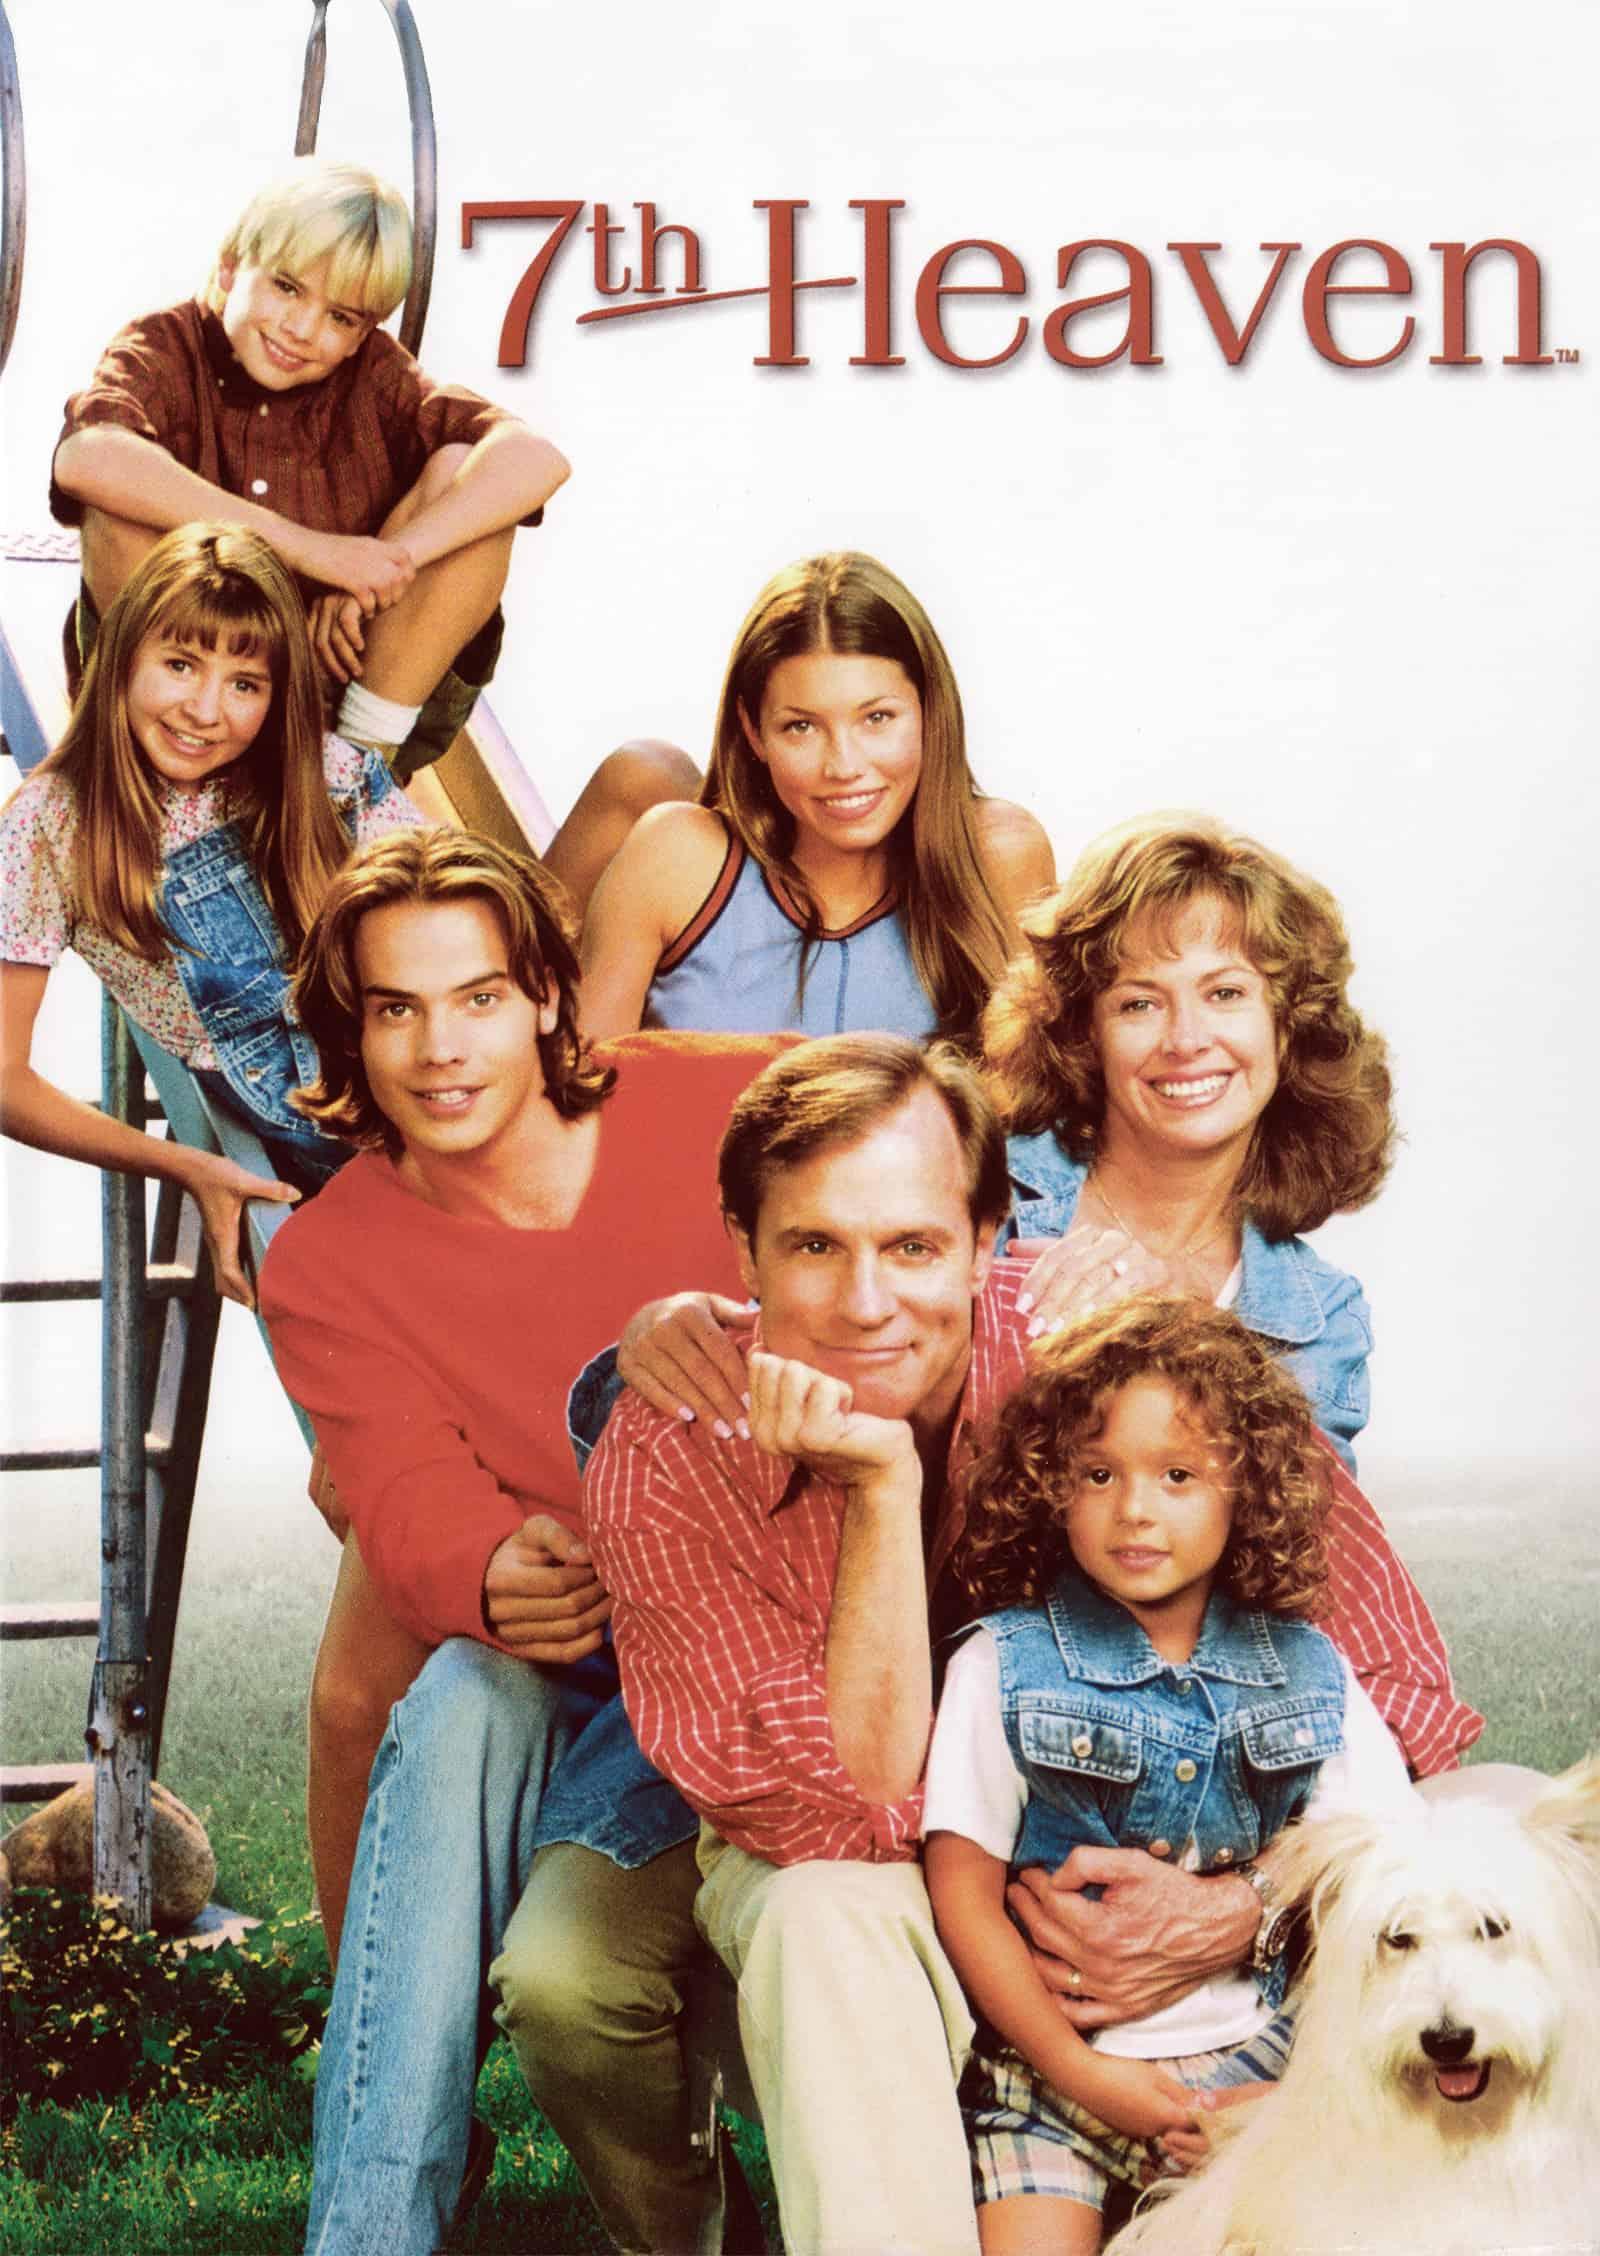 7th Heaven, 1996